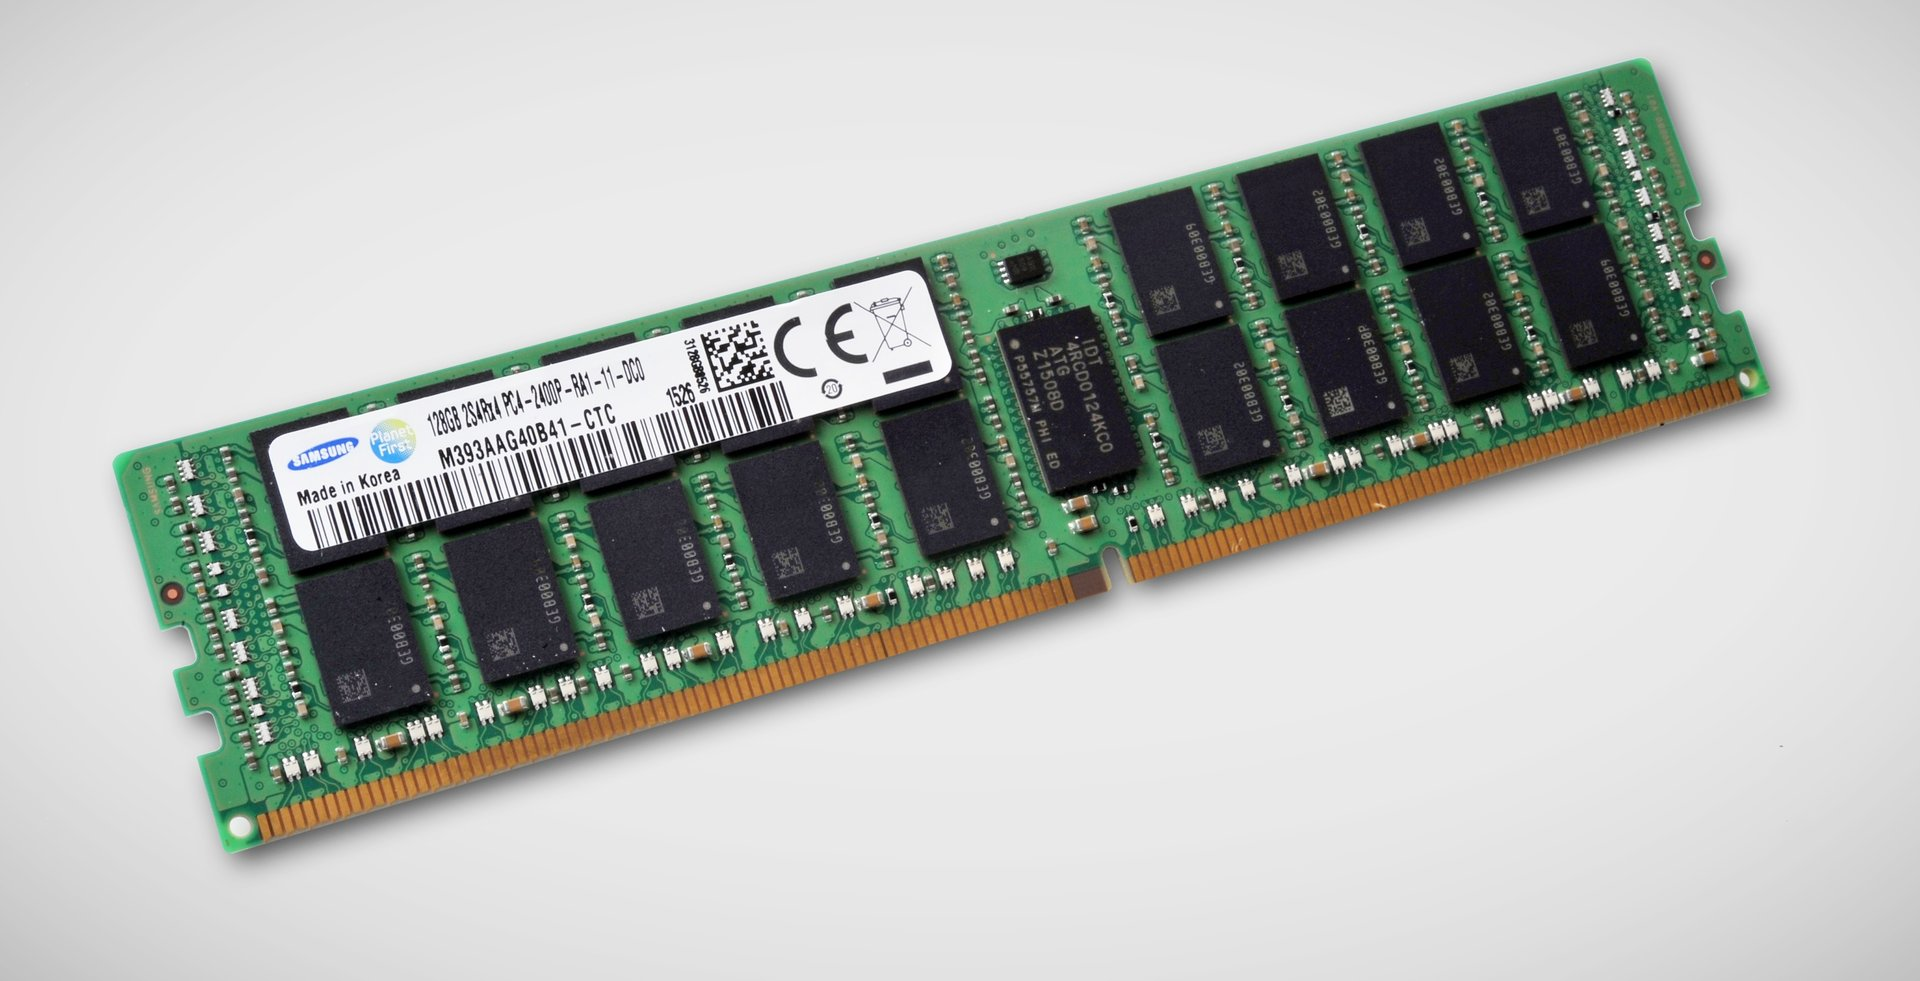 Samsung 128-GByte-TSV-RDIMM